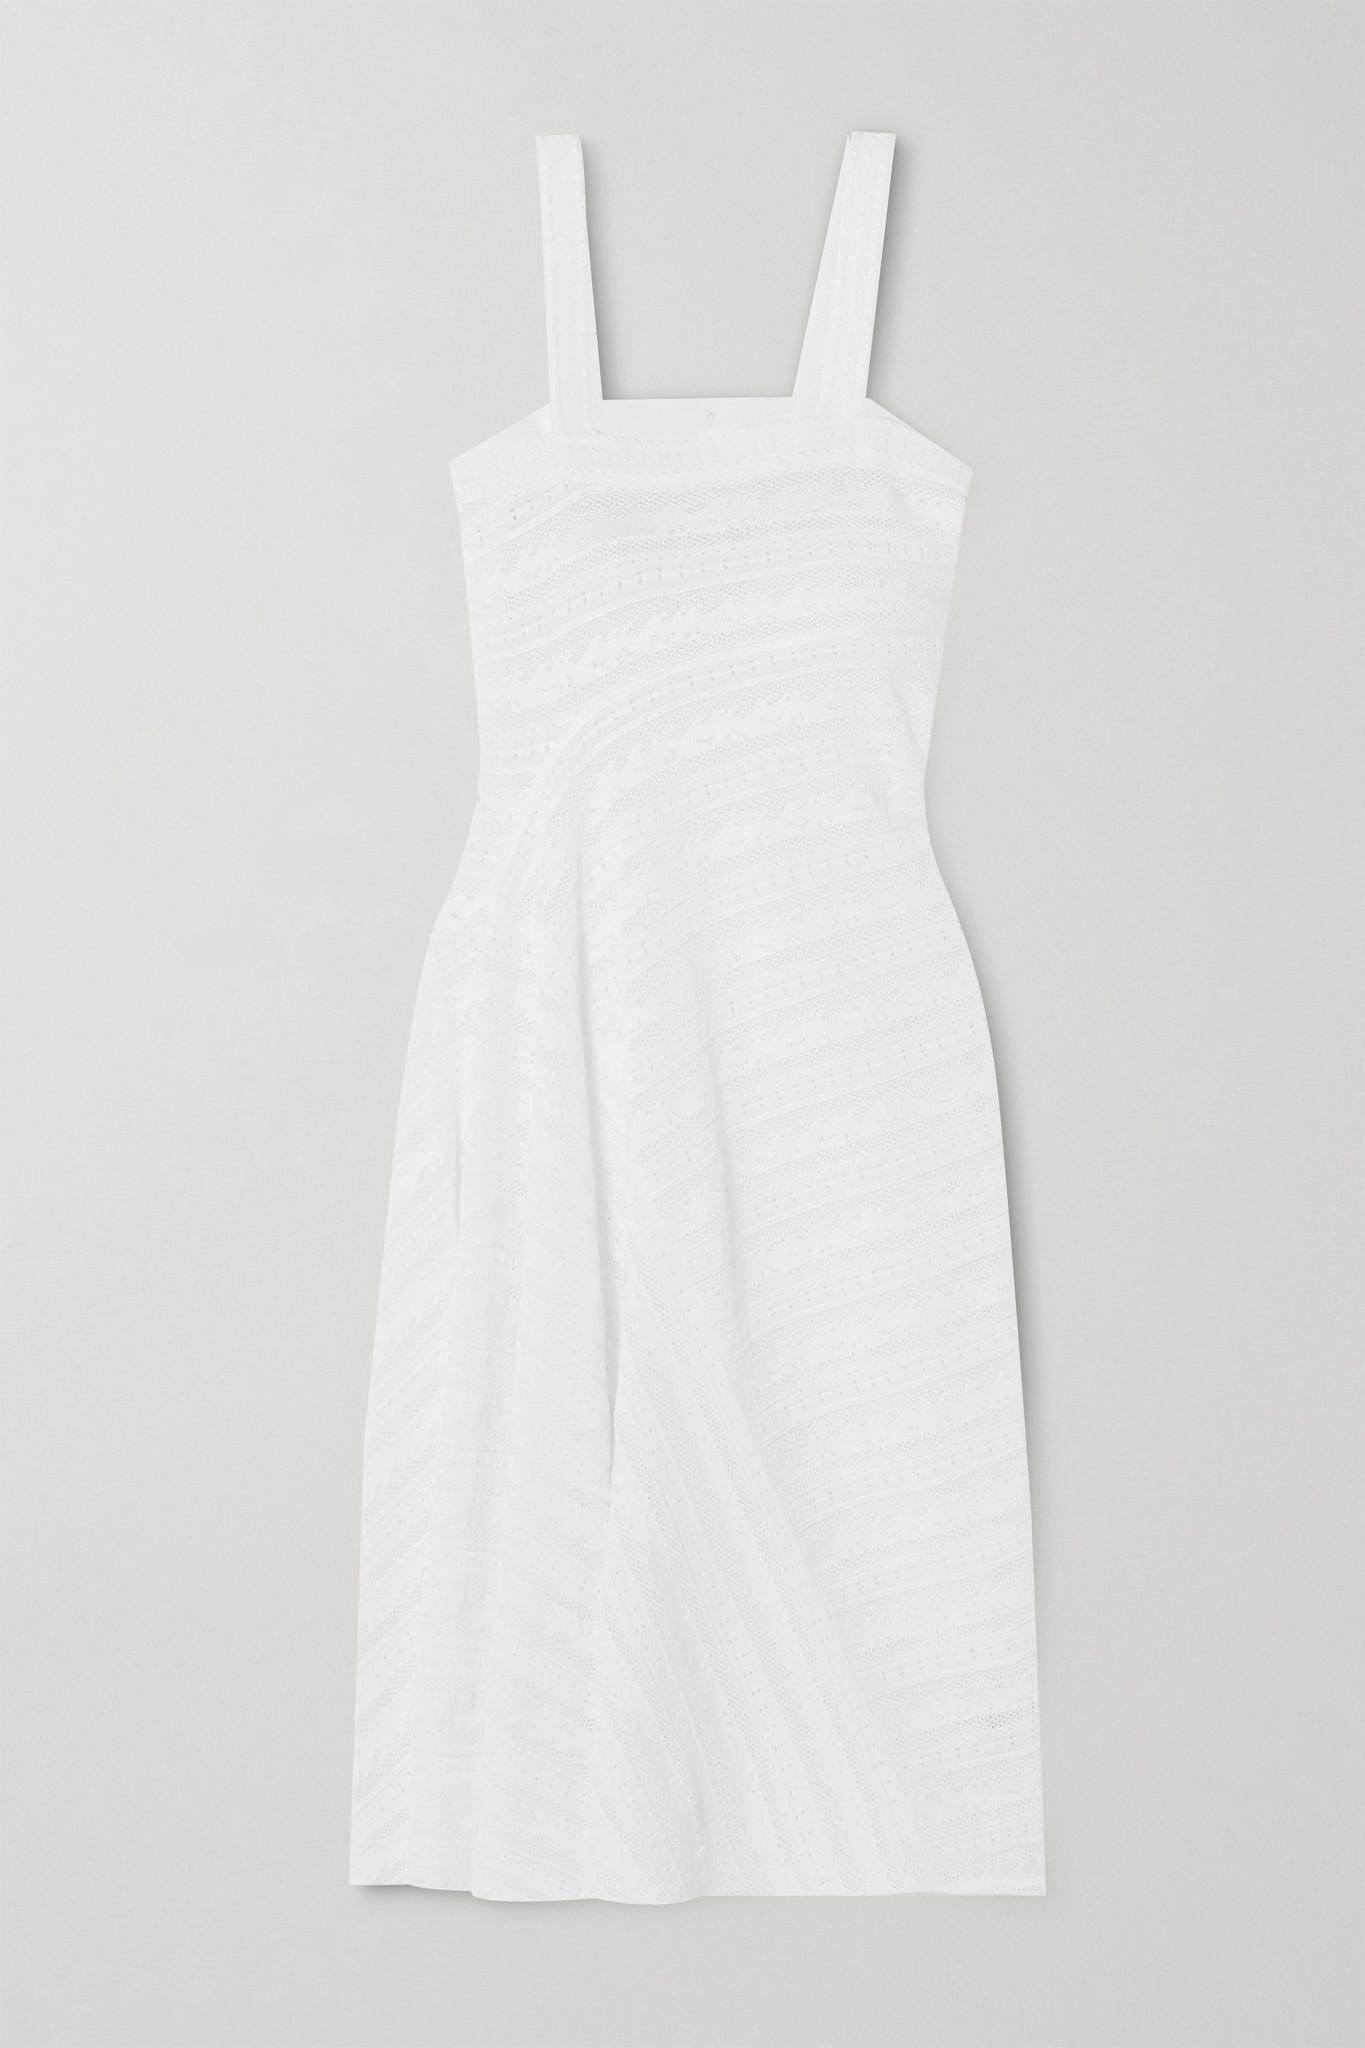 ALAÏA - Stretch-lace Dress - White - FR36